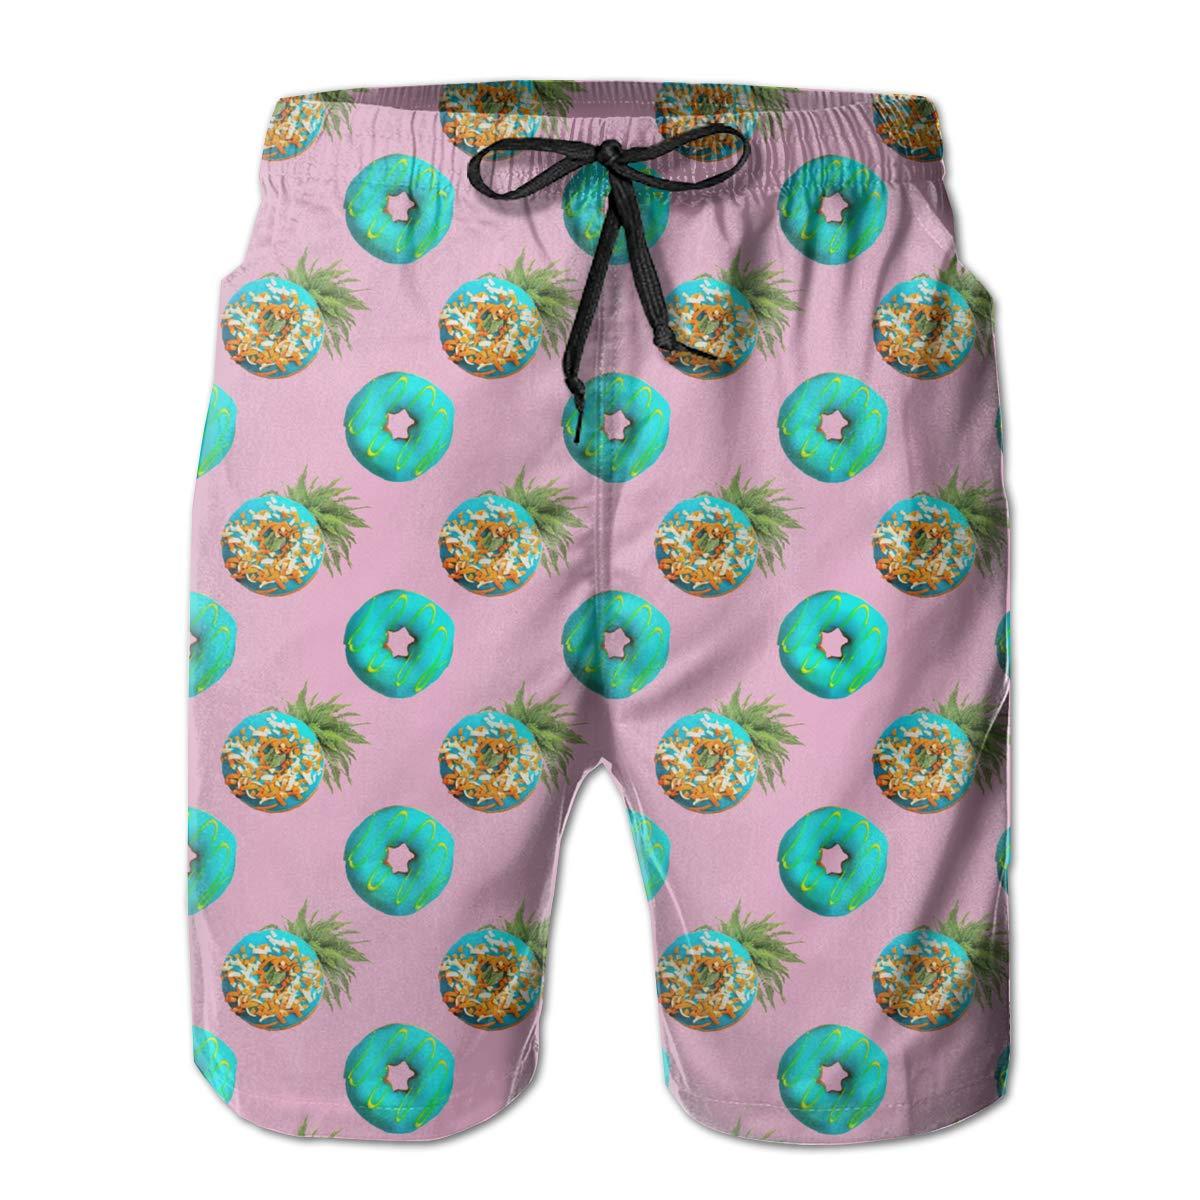 FUNSTYEET Pineapple Doughnut Pink Mens Board Shorts Swim Mesh Lining and Side Pocket